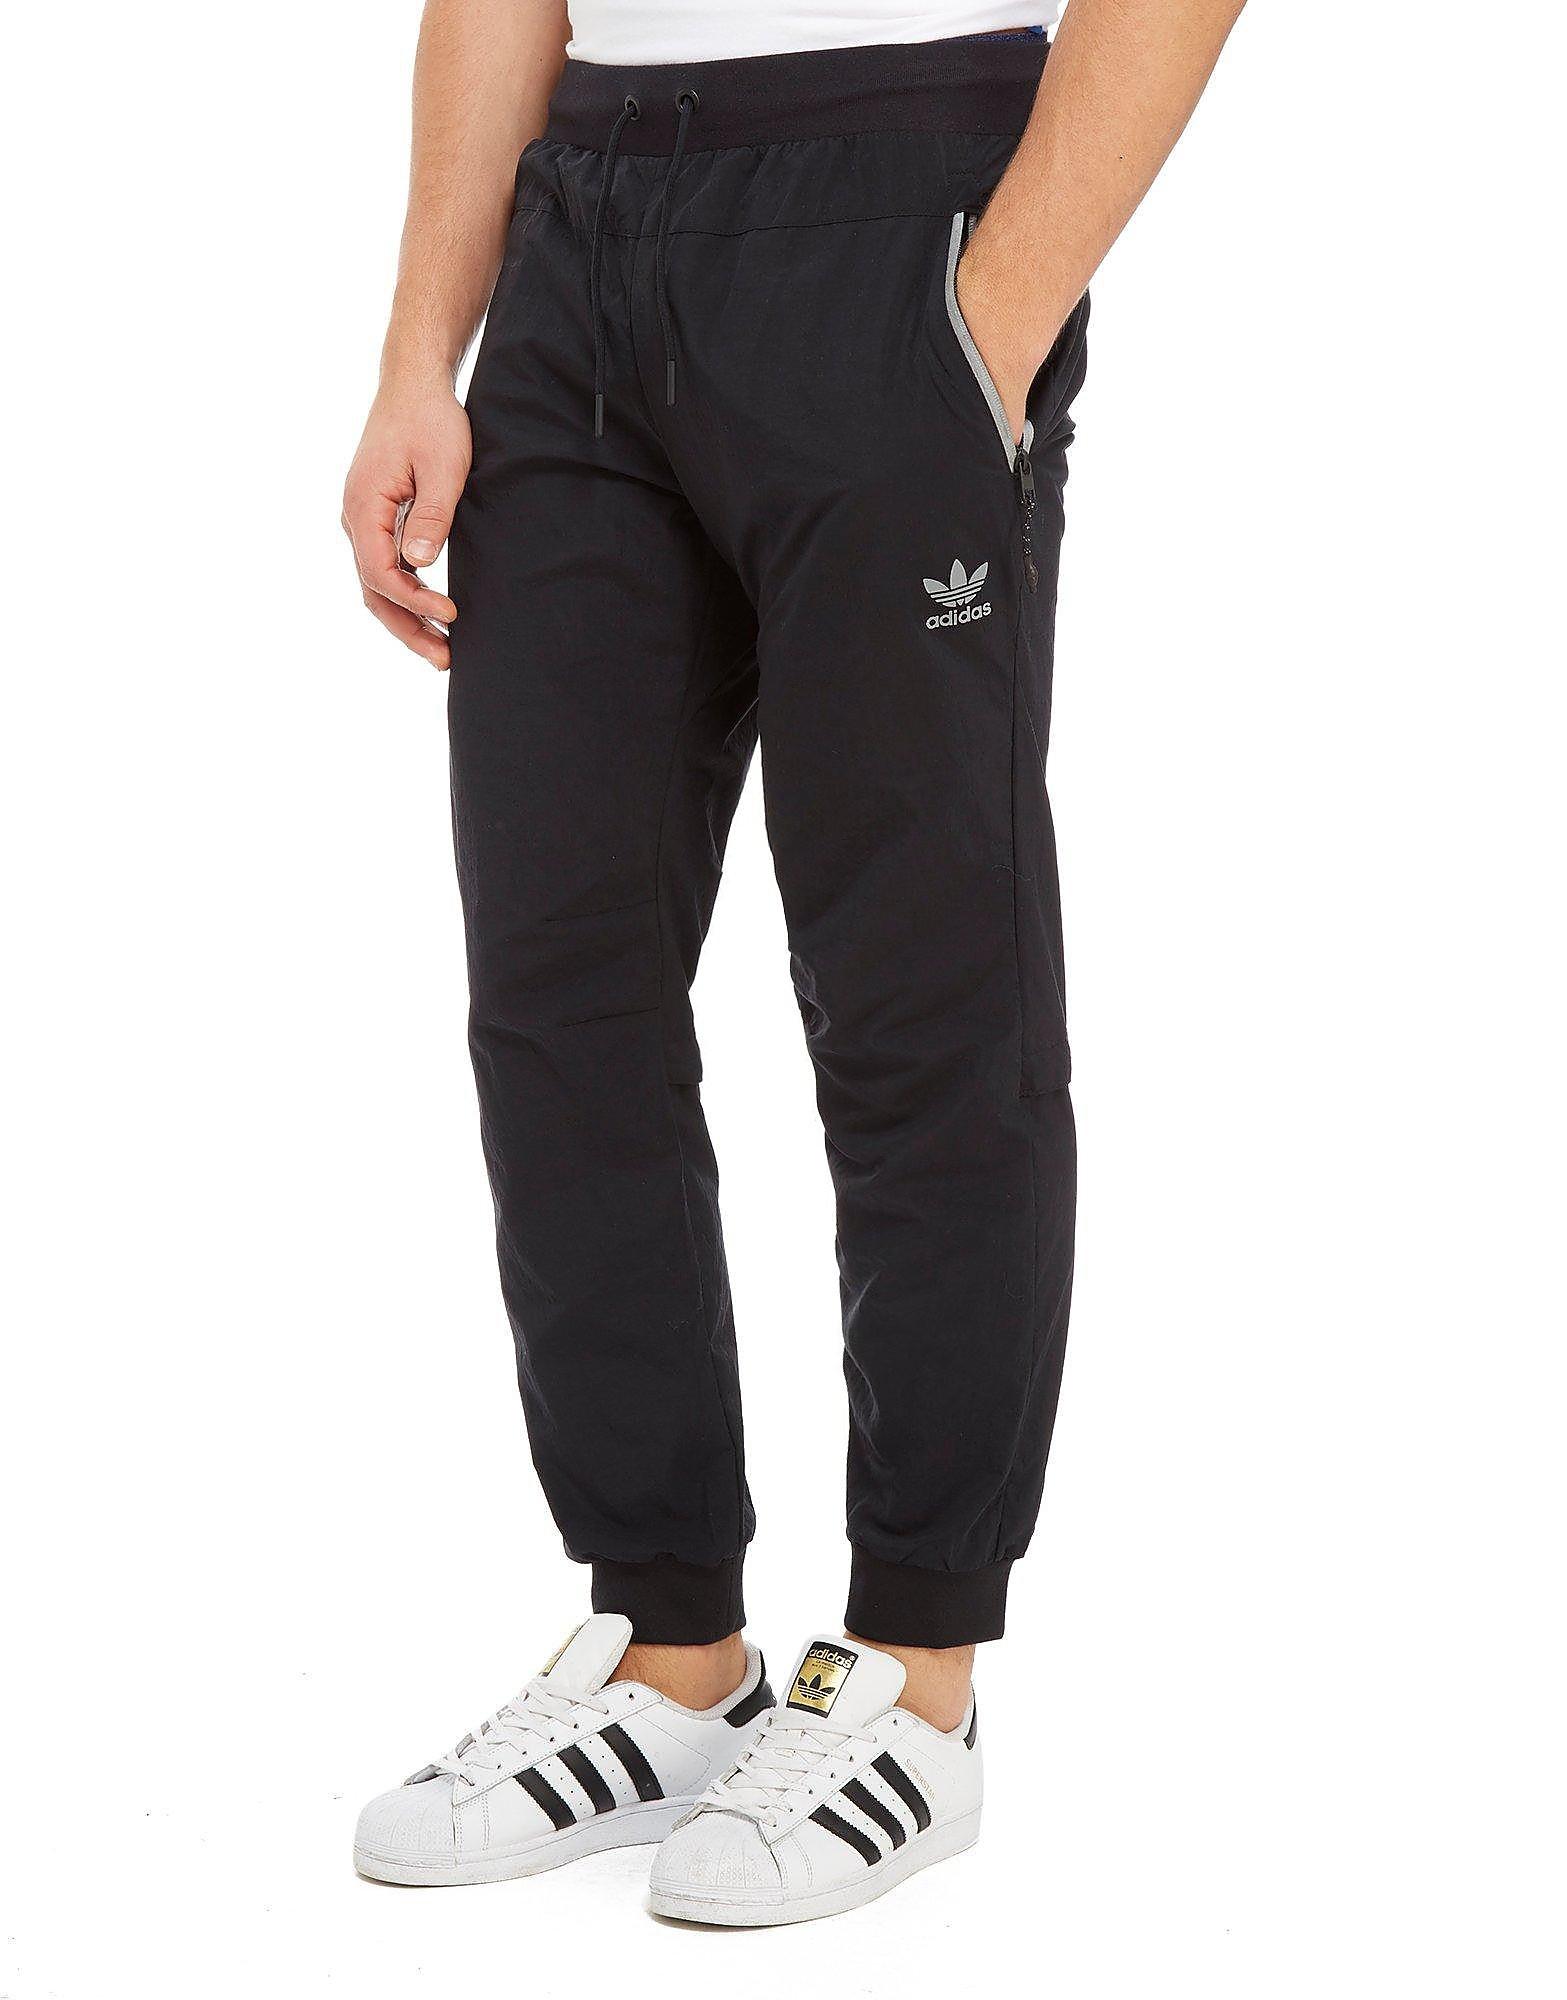 adidas Originals Sportlux Woven Pants